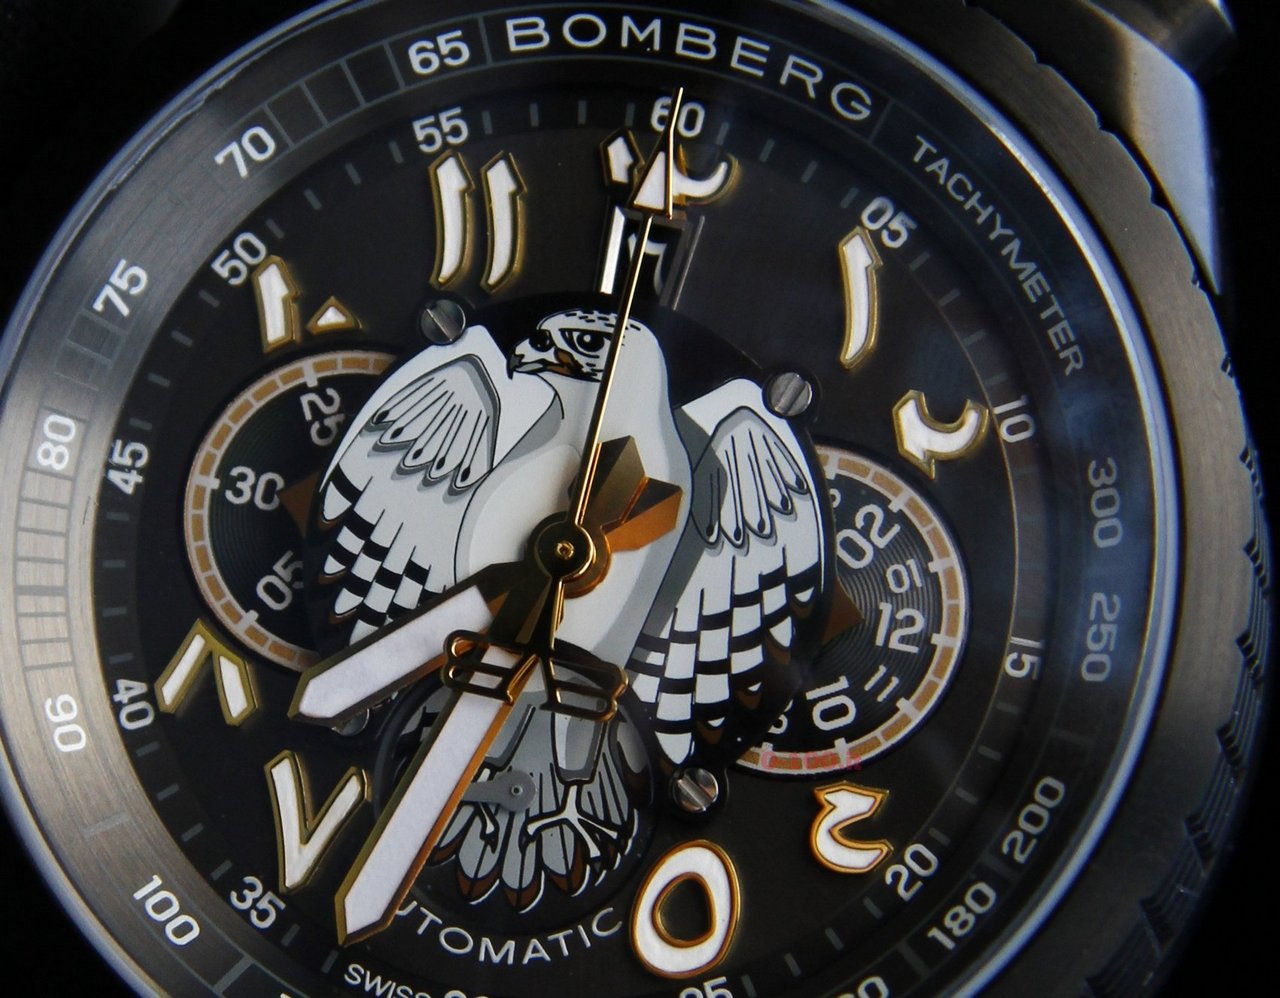 baselworld-2015_bomberg-bolt-68-falcon-chronograph_0-100-8